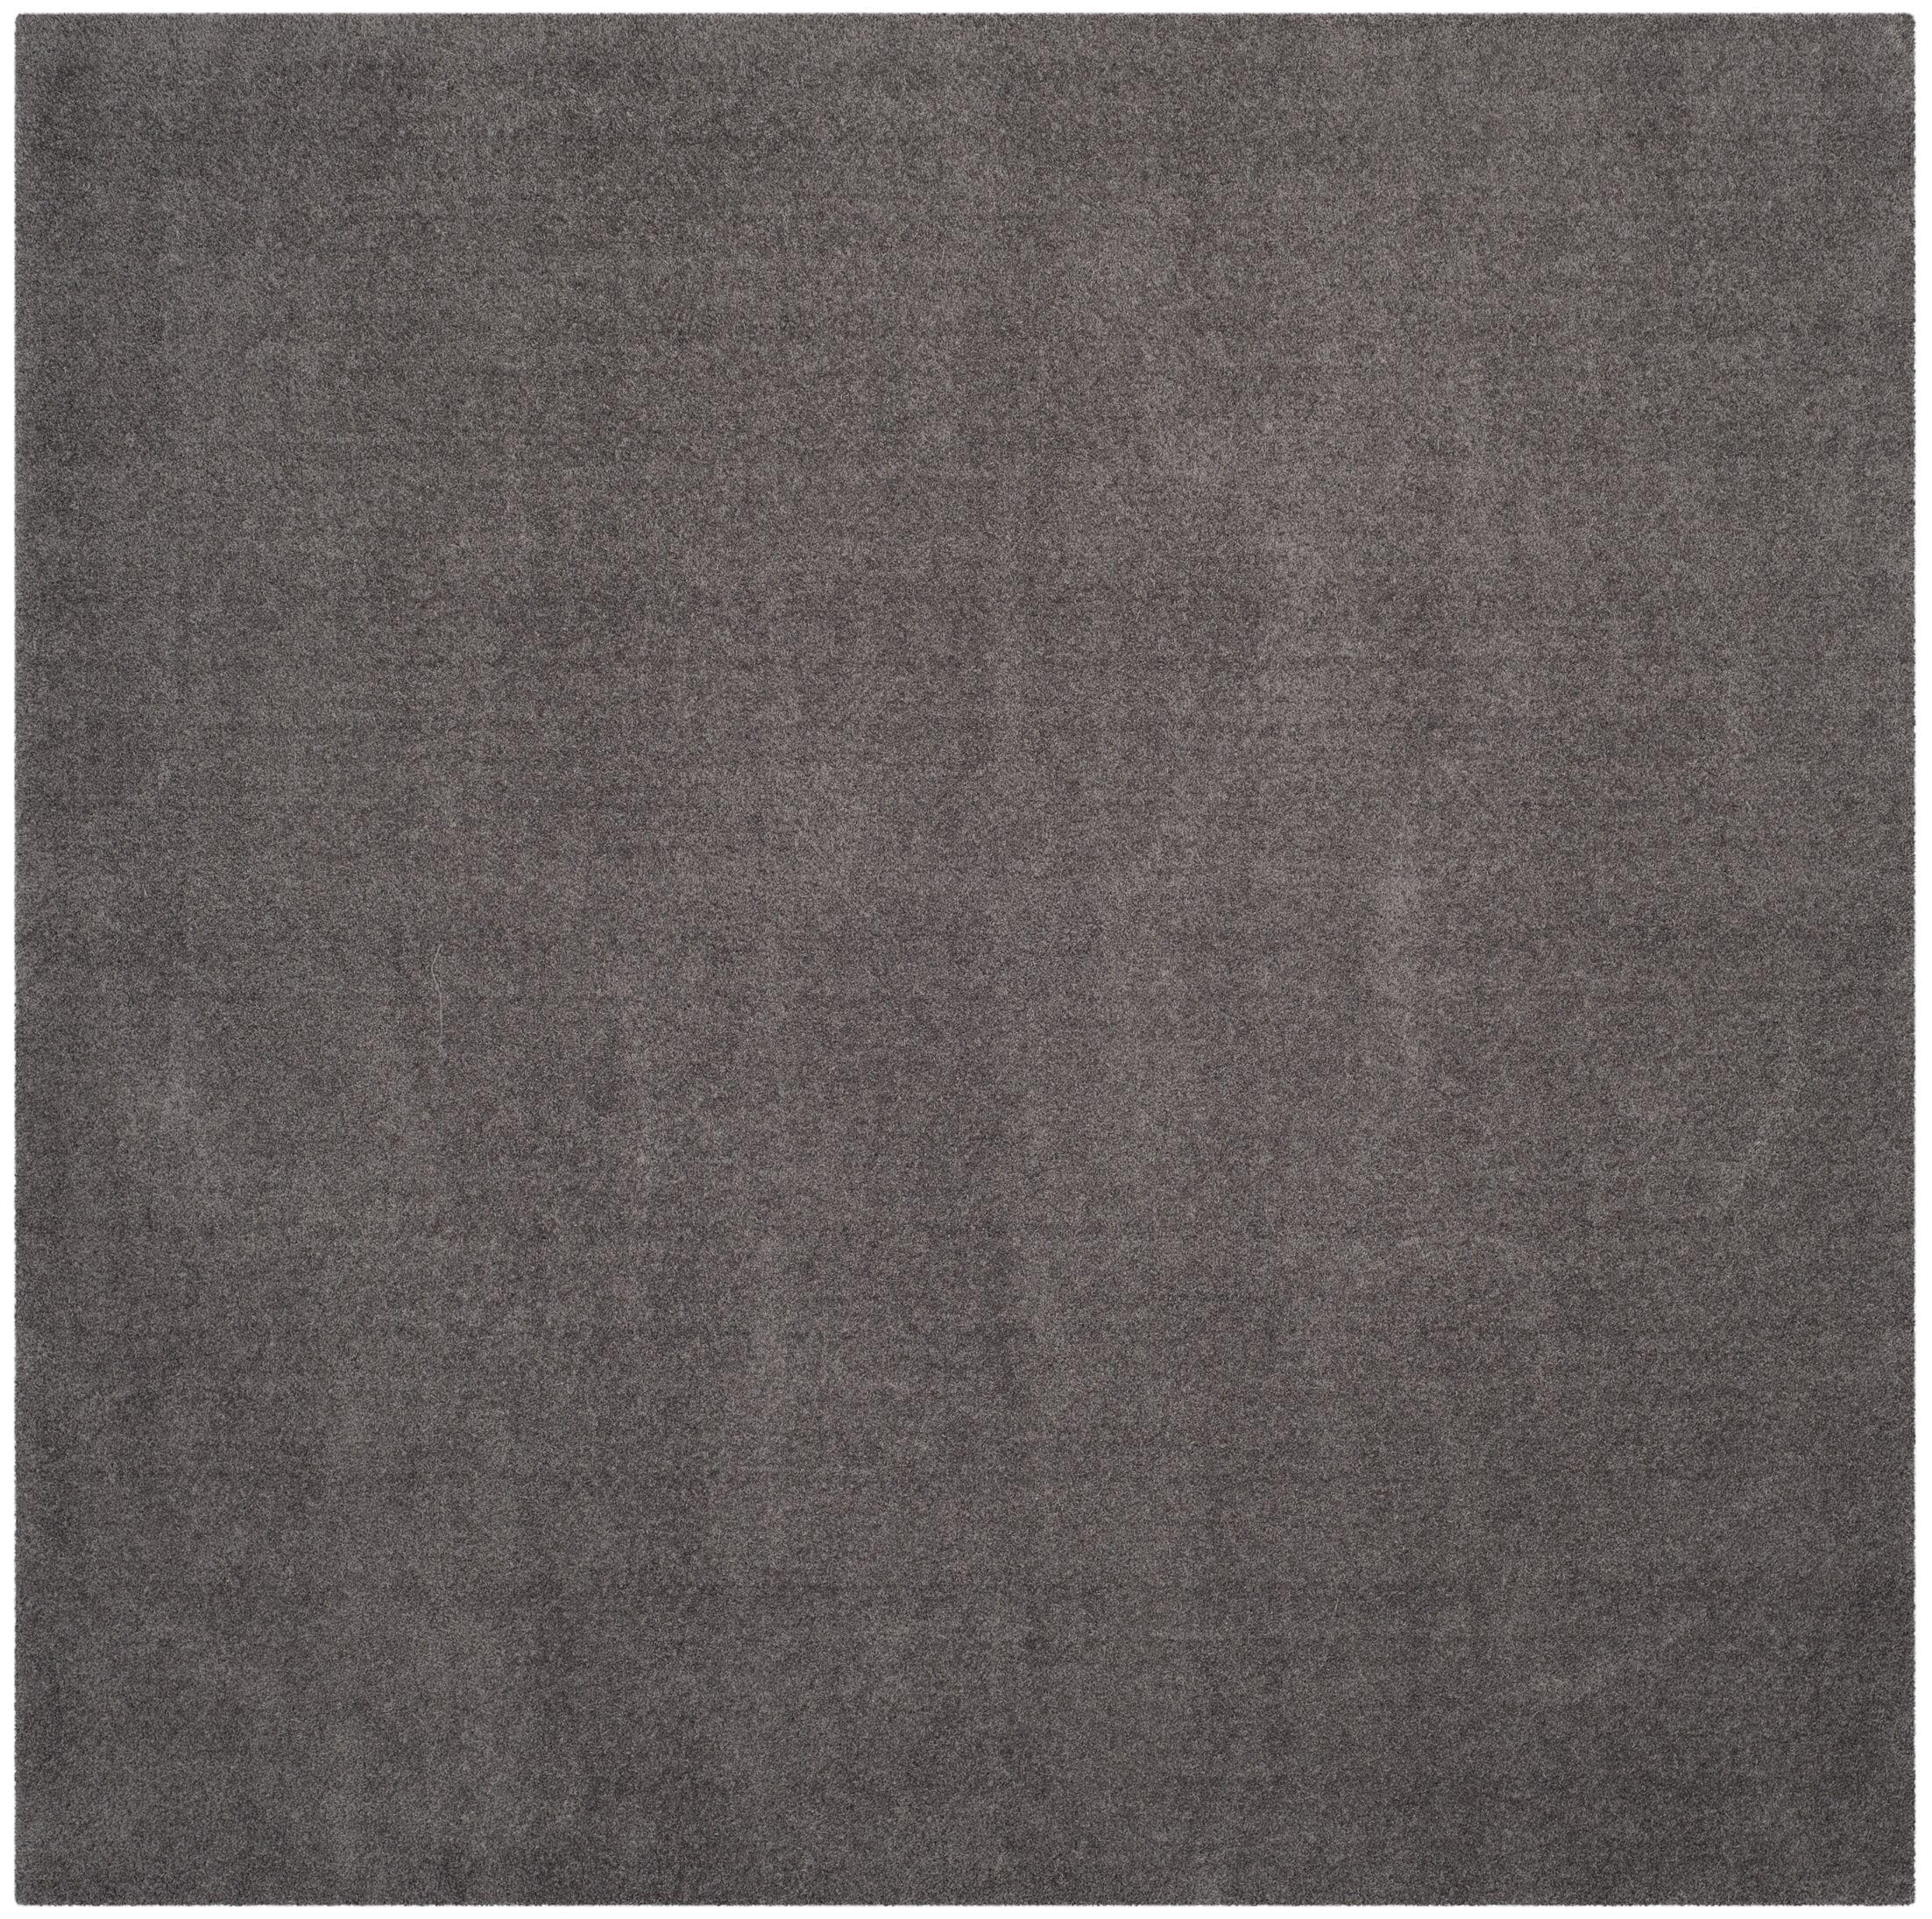 Blackstock Gray Area Rug Rug Size: Square 6'7